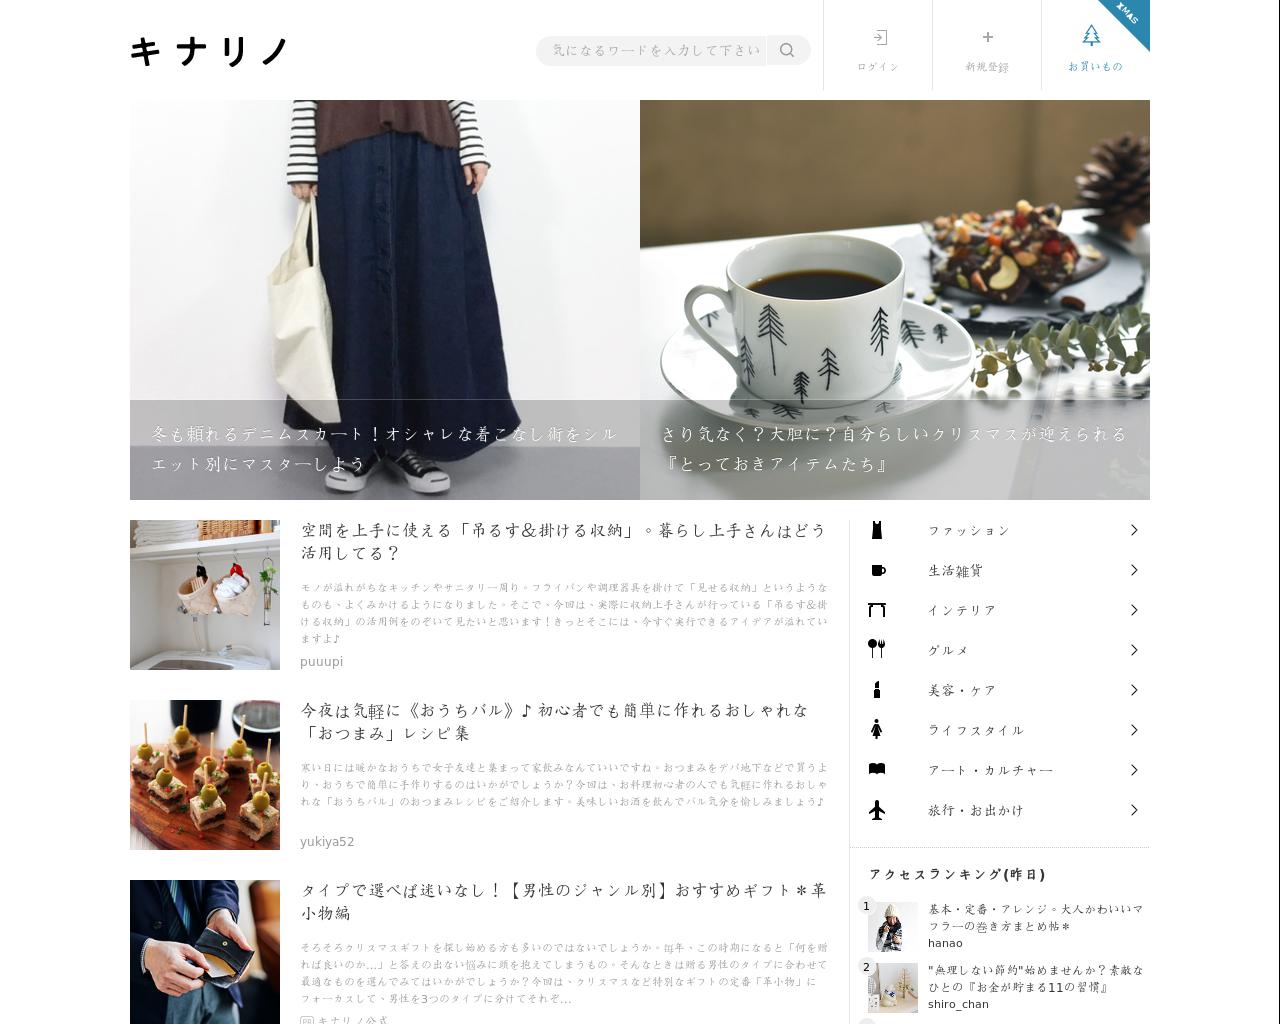 tsuyoshi.in(2017/12/07 03:45:31)